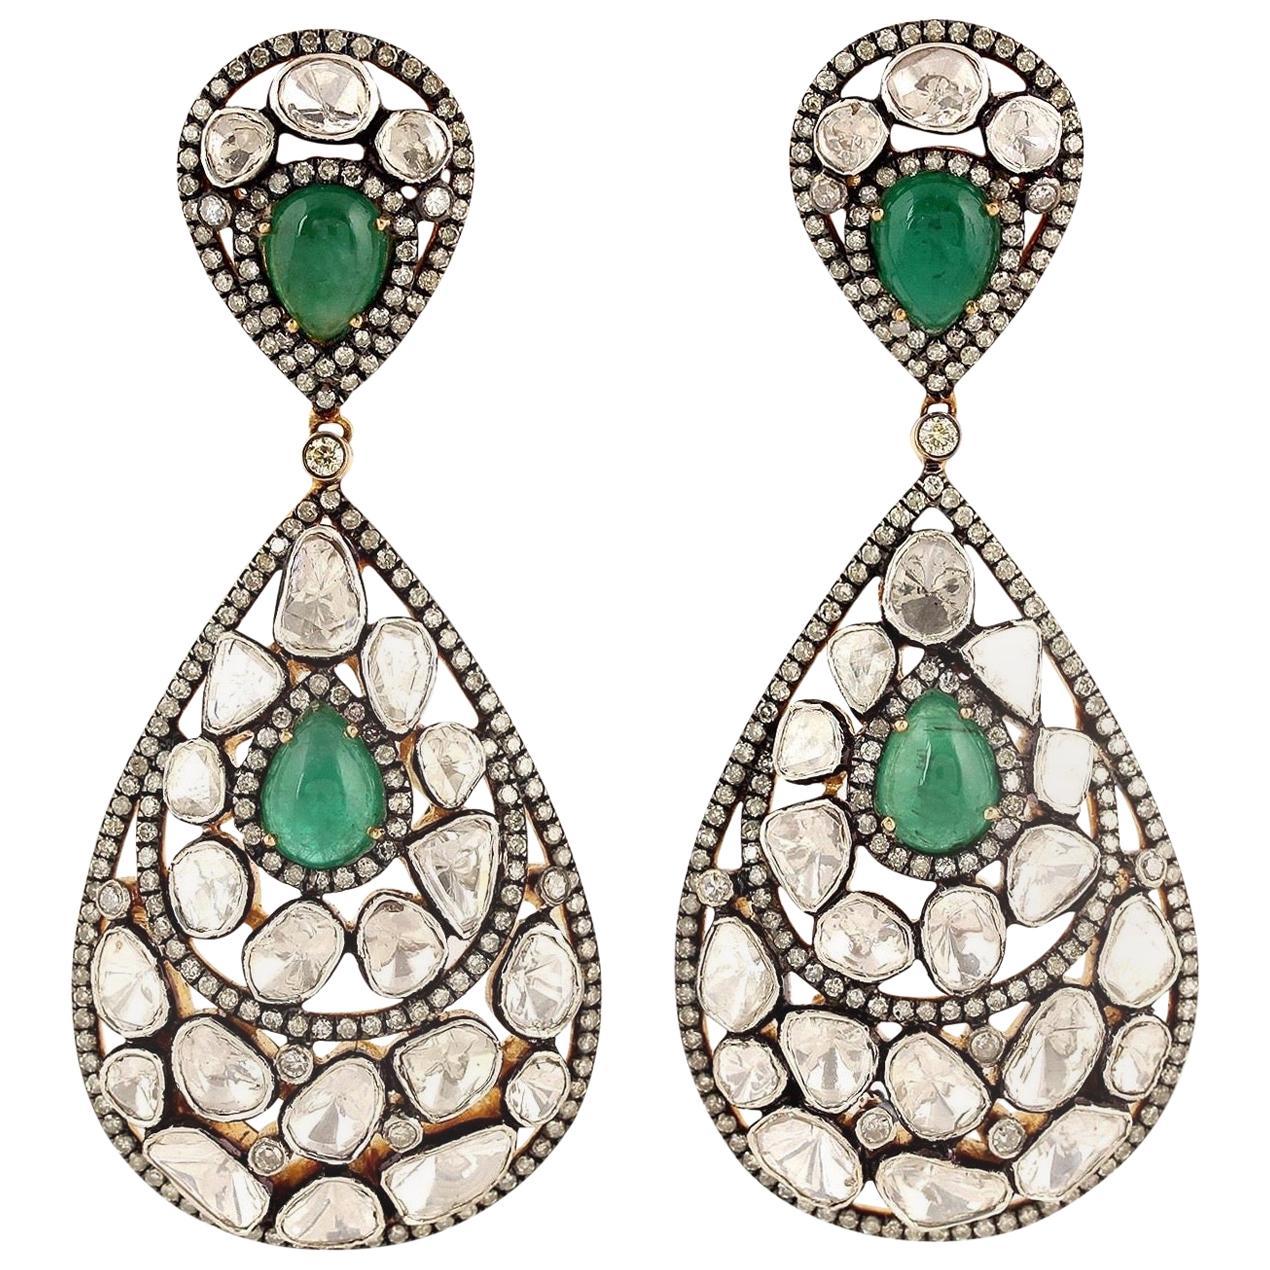 Antique Style Emerald Rose Cut Diamond Earrings